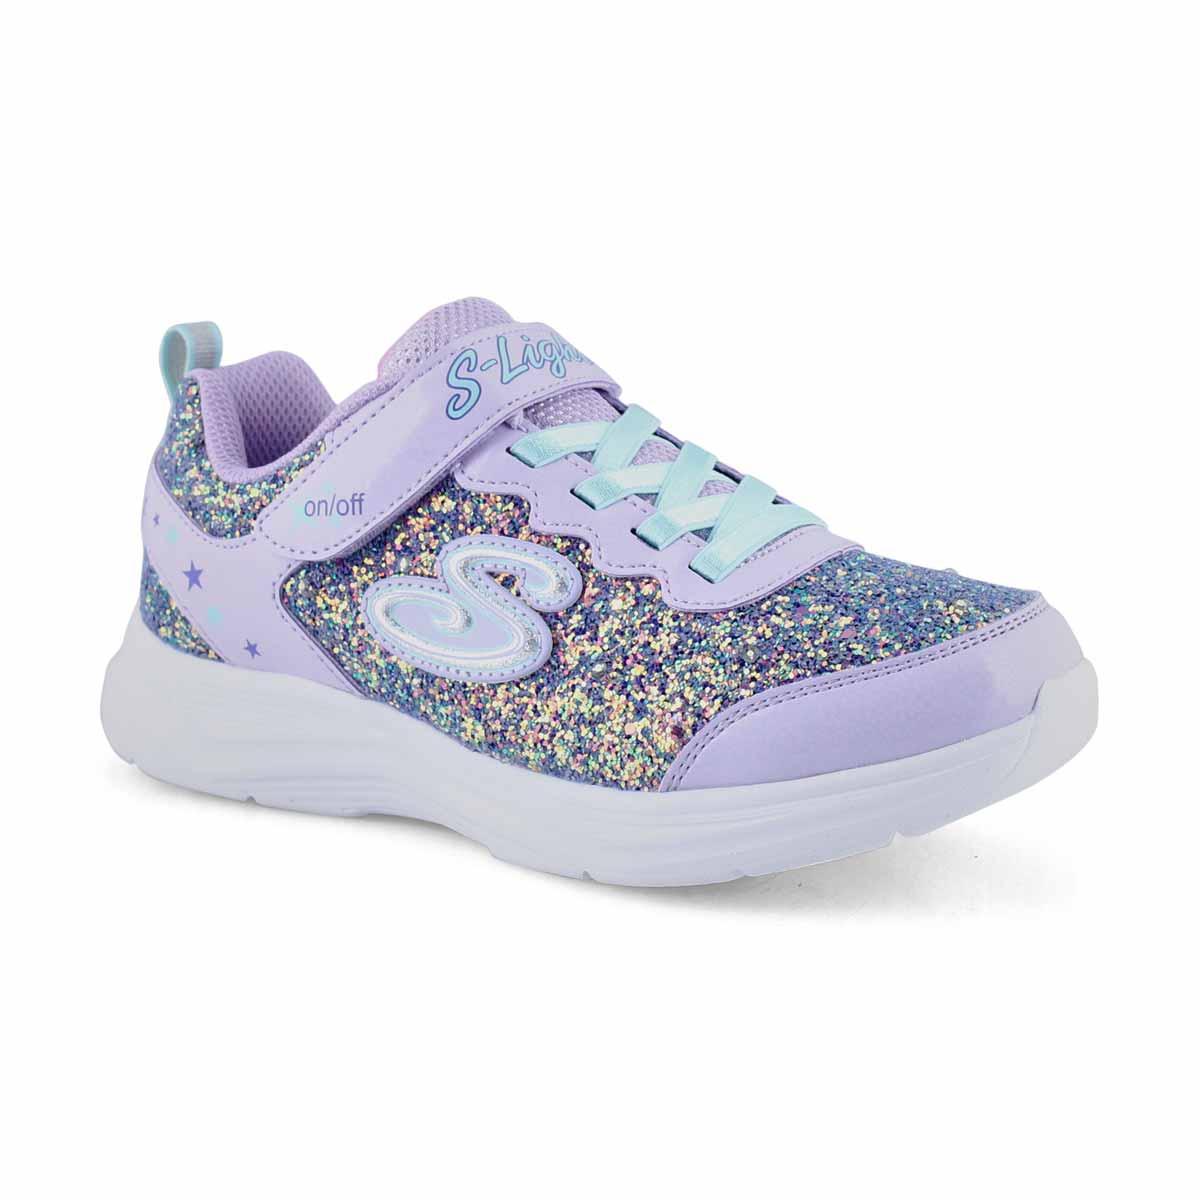 Toddlers' Glimmer Kicks Sneaker - Lavender